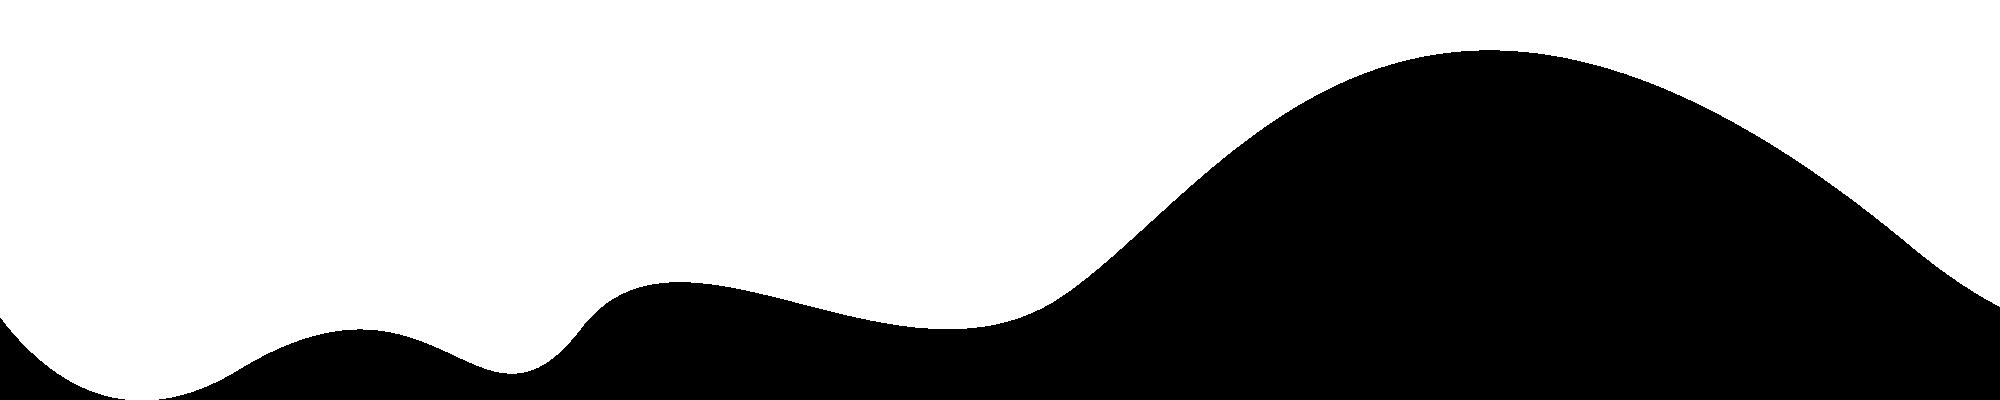 Pattern 01